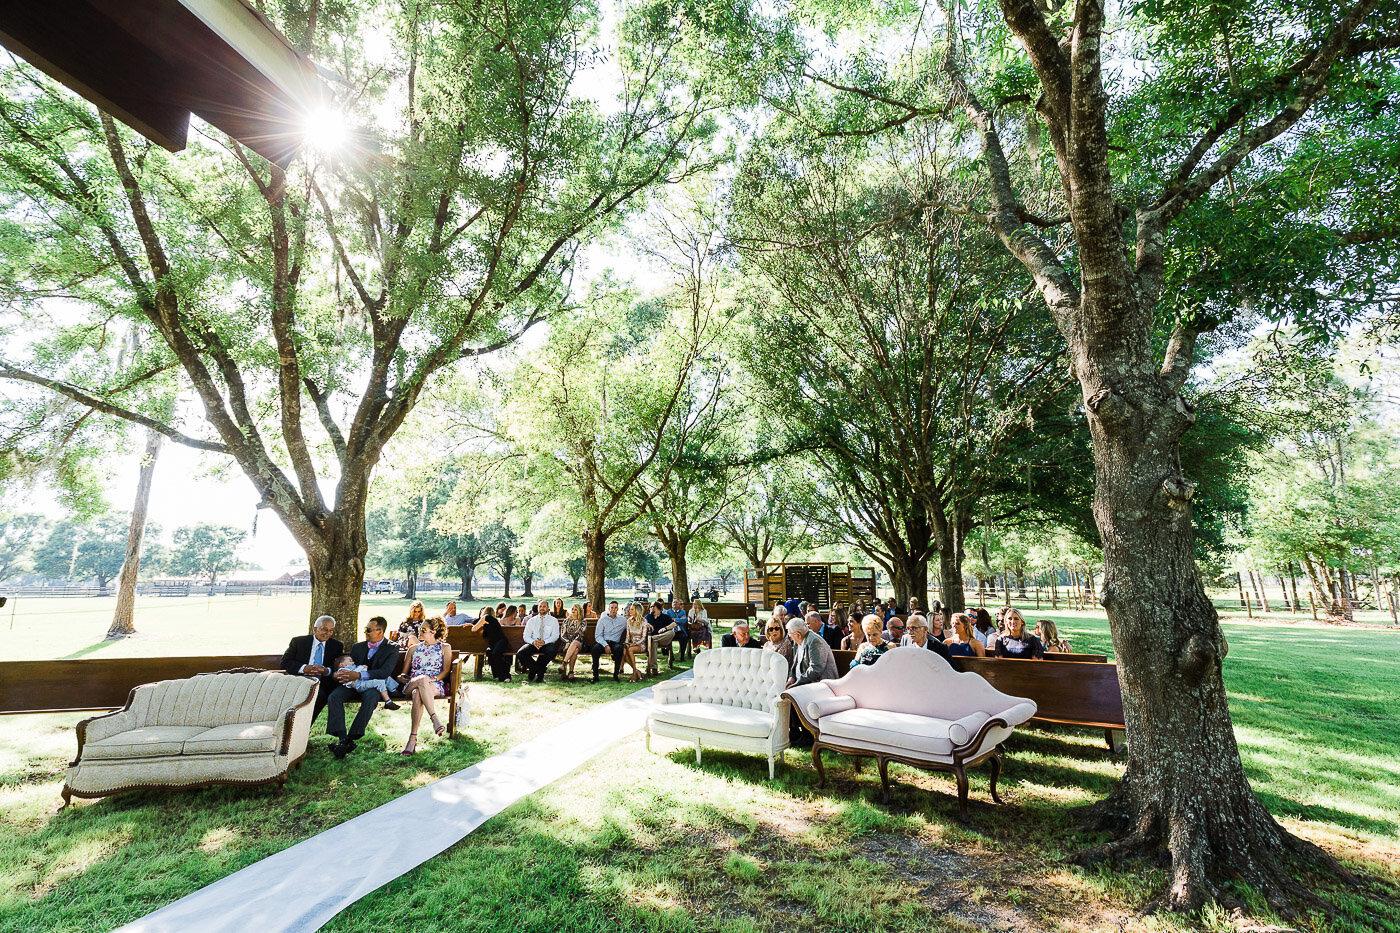 Lakeland-barn-wedding-at-white-horse-ranch-35.jpg